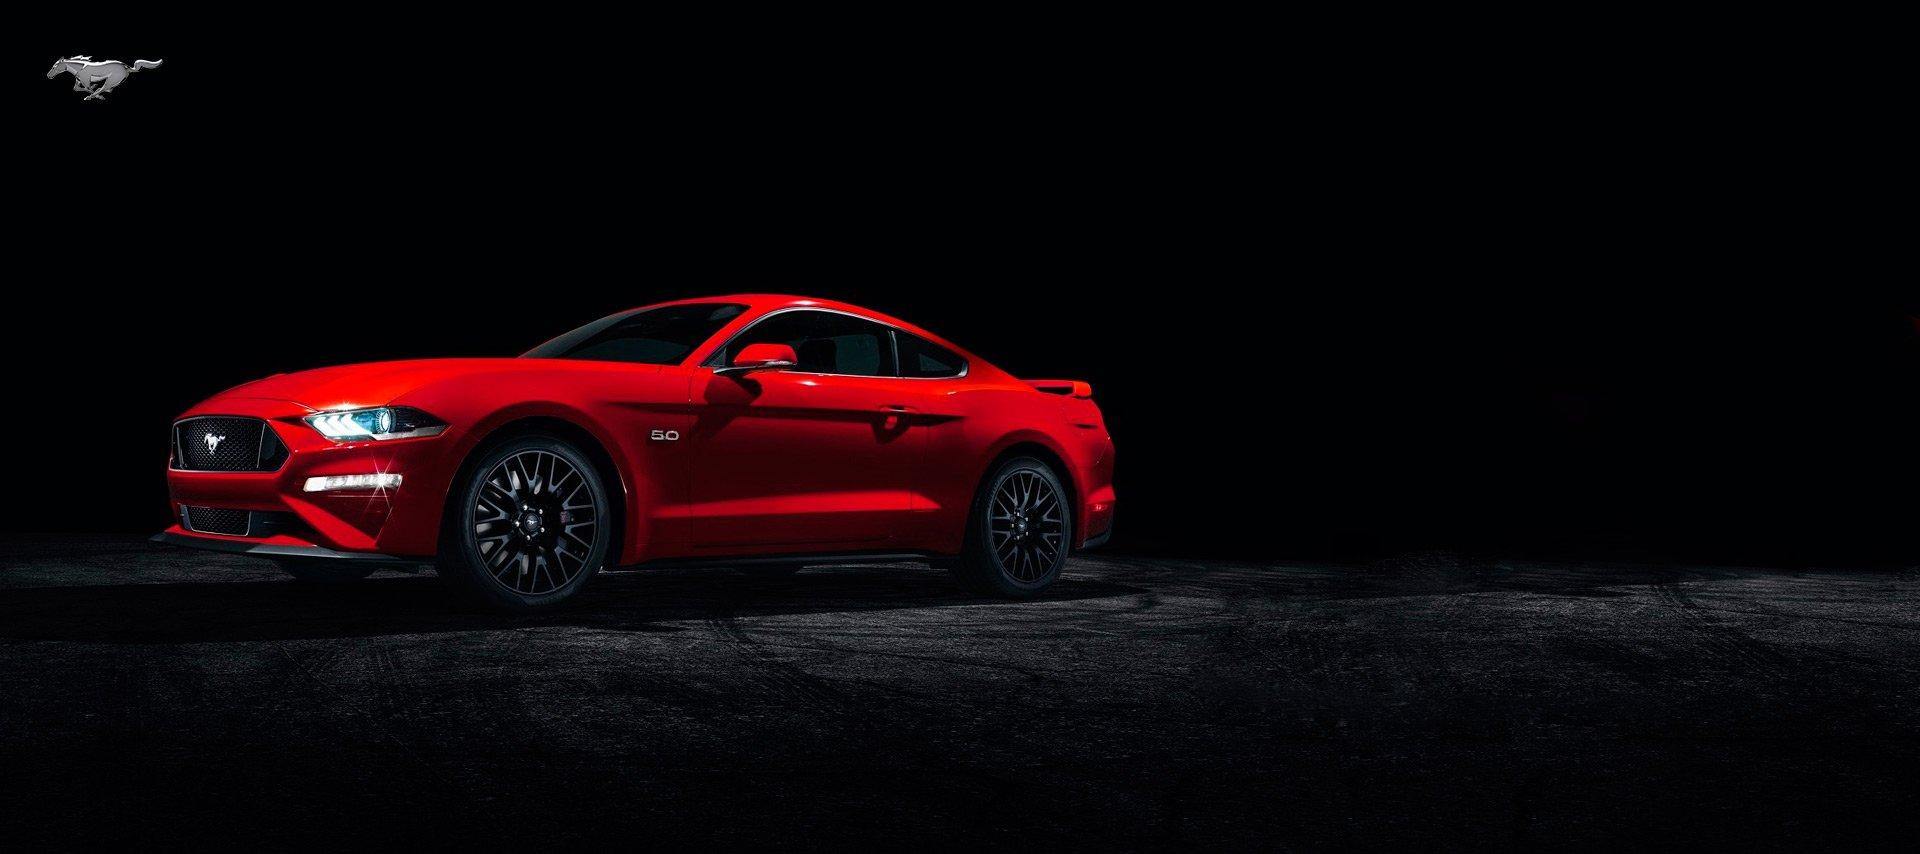 Novo Mustang 2018